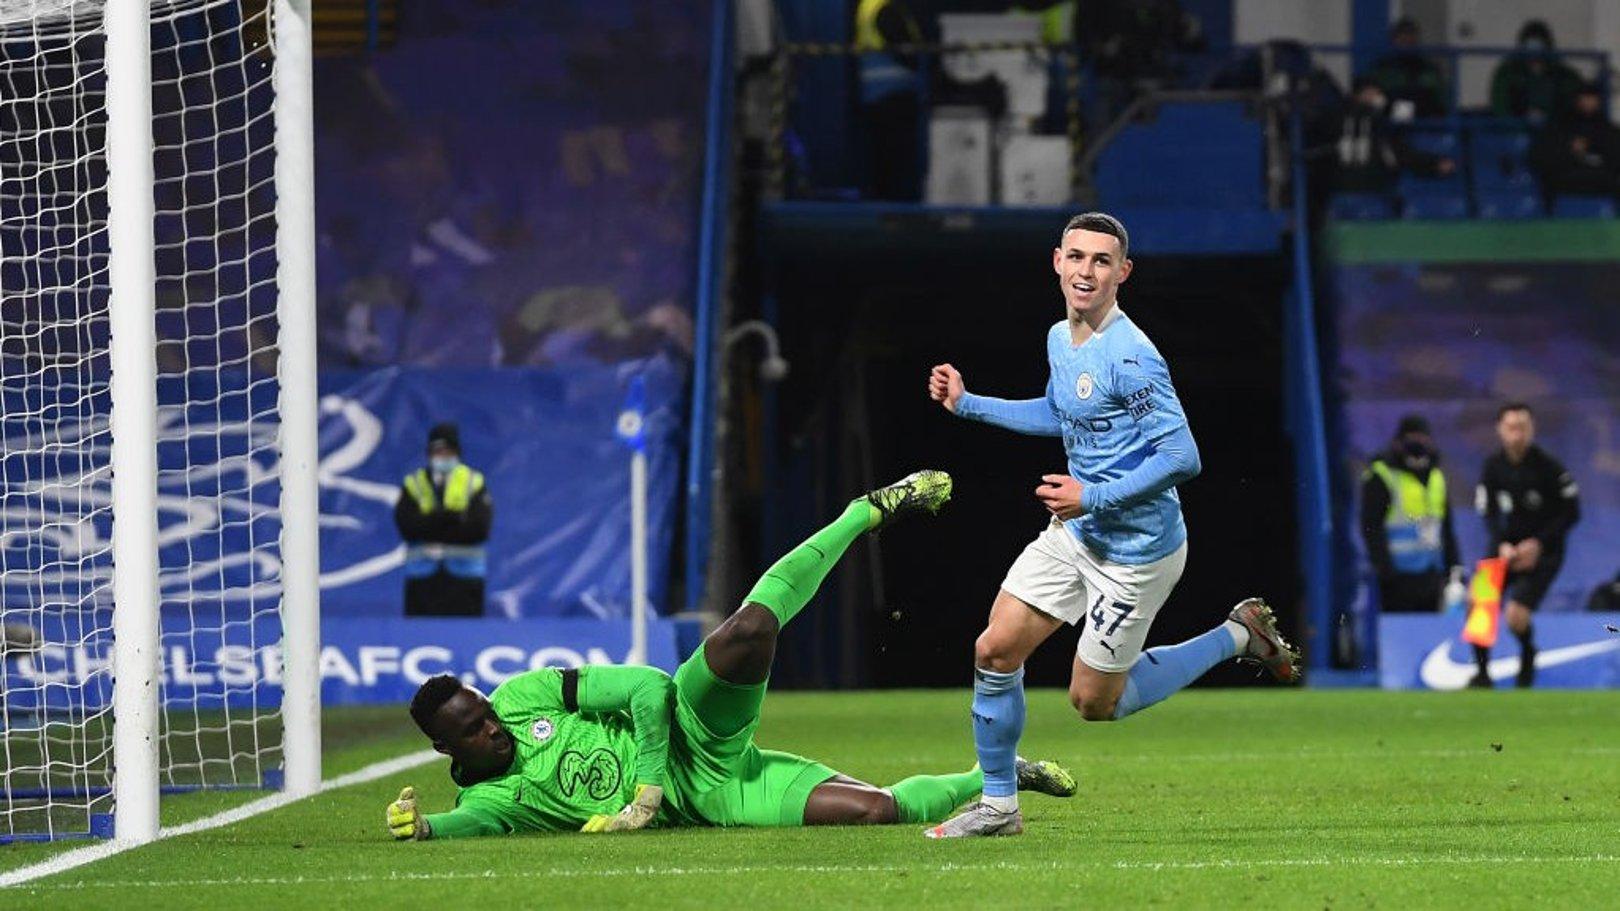 DOUBLE DELIGHT: Phil Foden celebrates adding a second